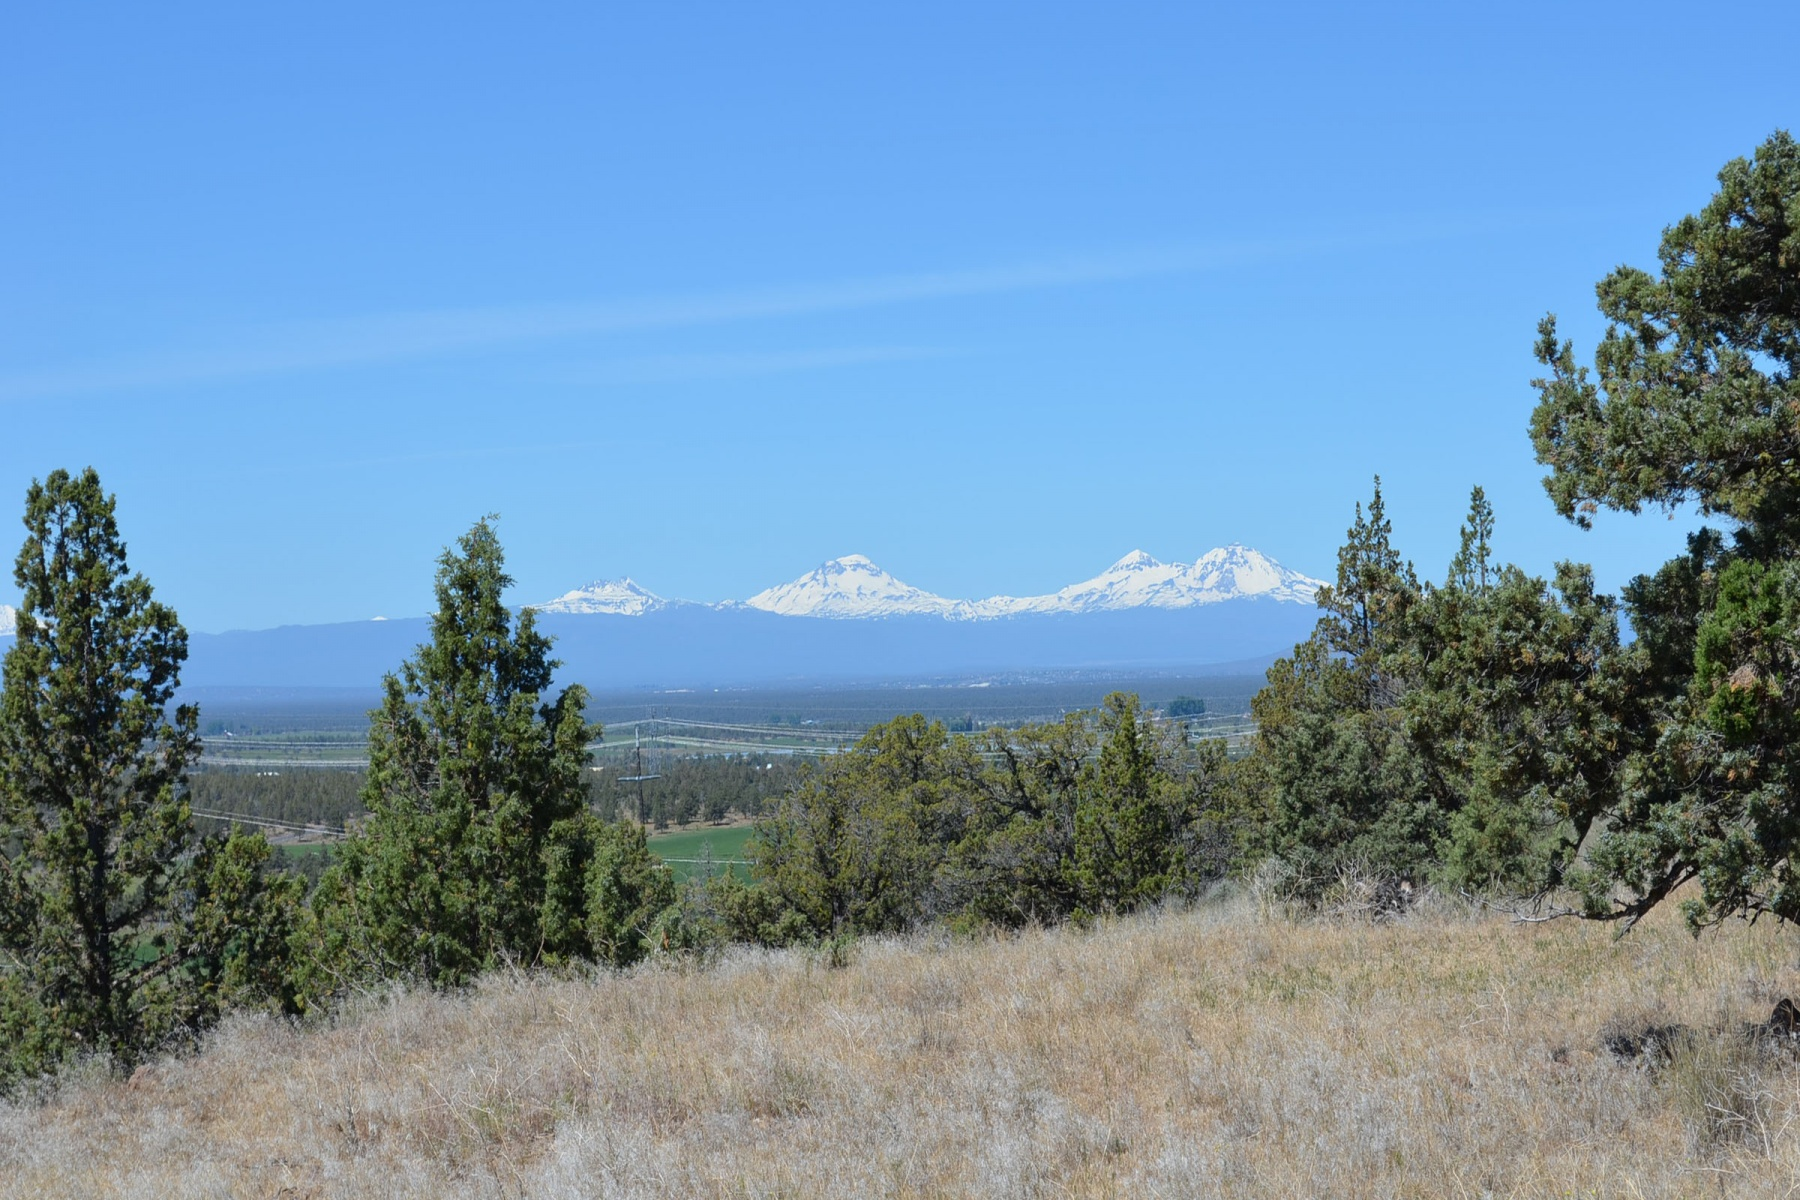 Đất đai vì Bán tại TL 100 Westwood/Rosewood Drive, POWELL BUTTE Powell Butte, Oregon 97753 Hoa Kỳ